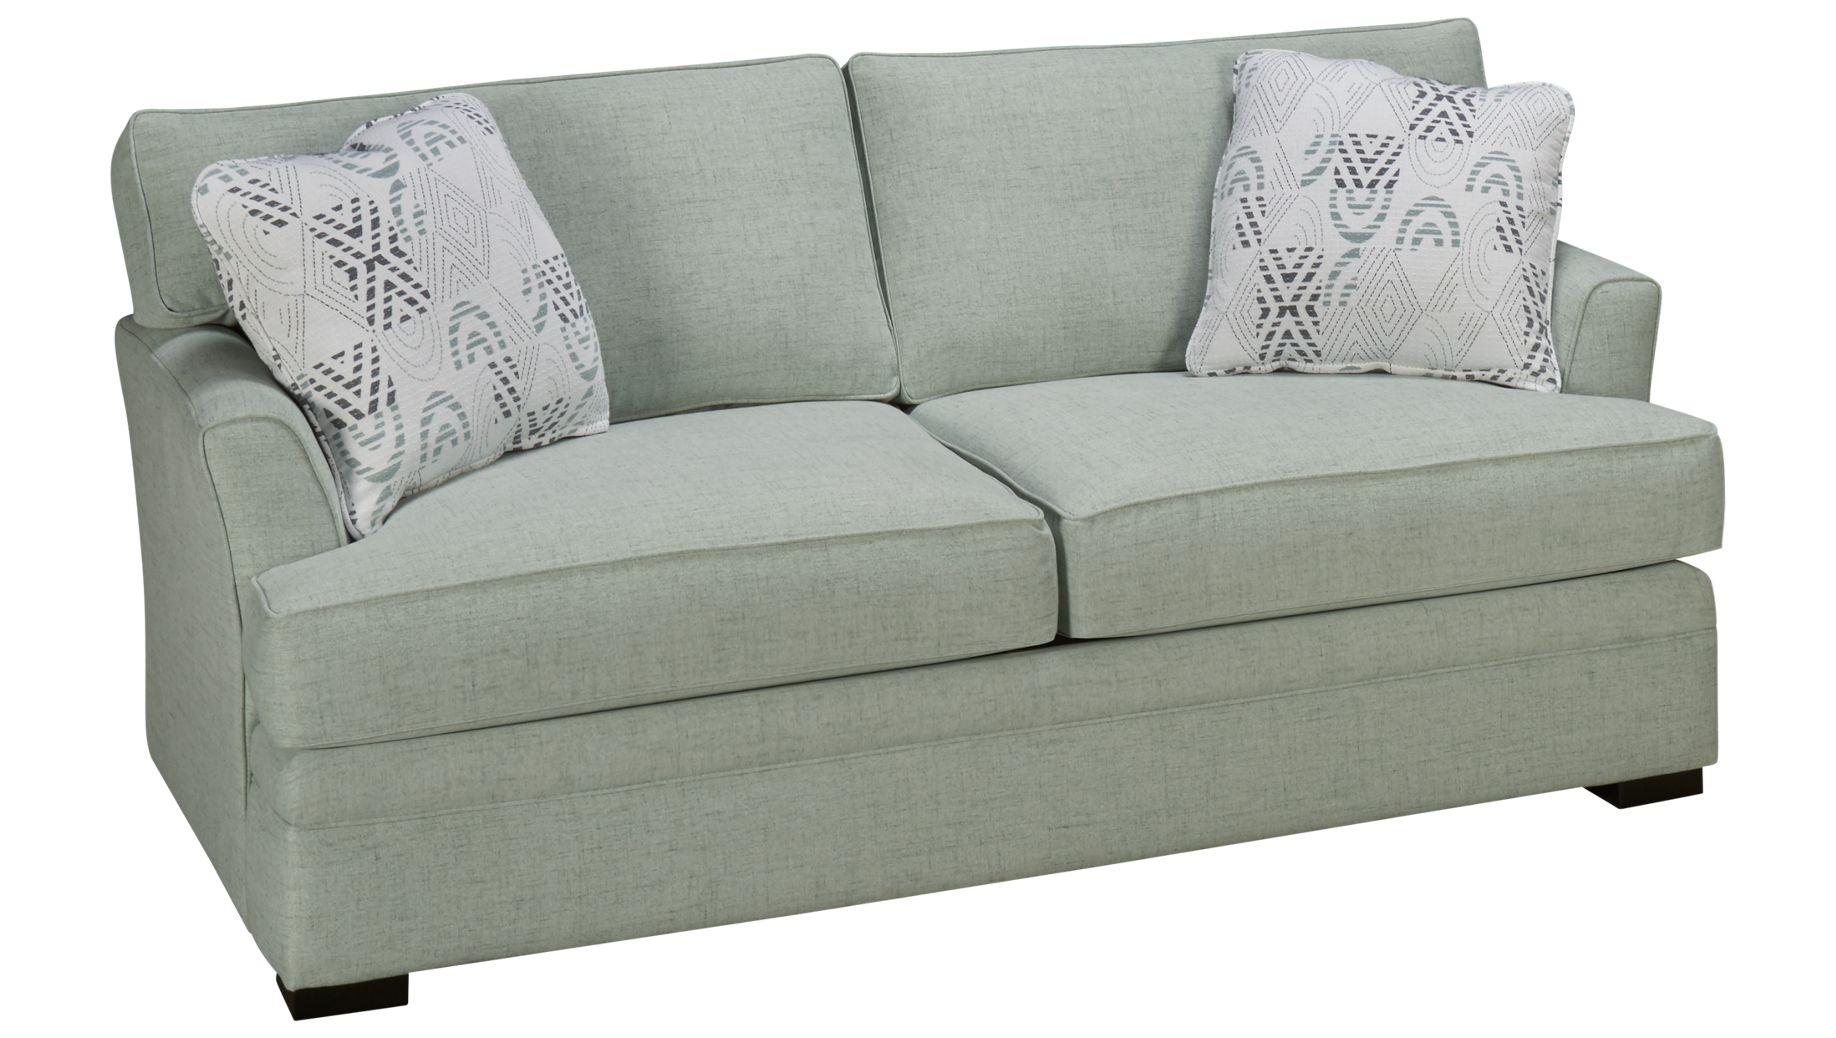 jonathan louischoicesjonathan louis choices condo sofa  - jonathan louis choices condo sofa